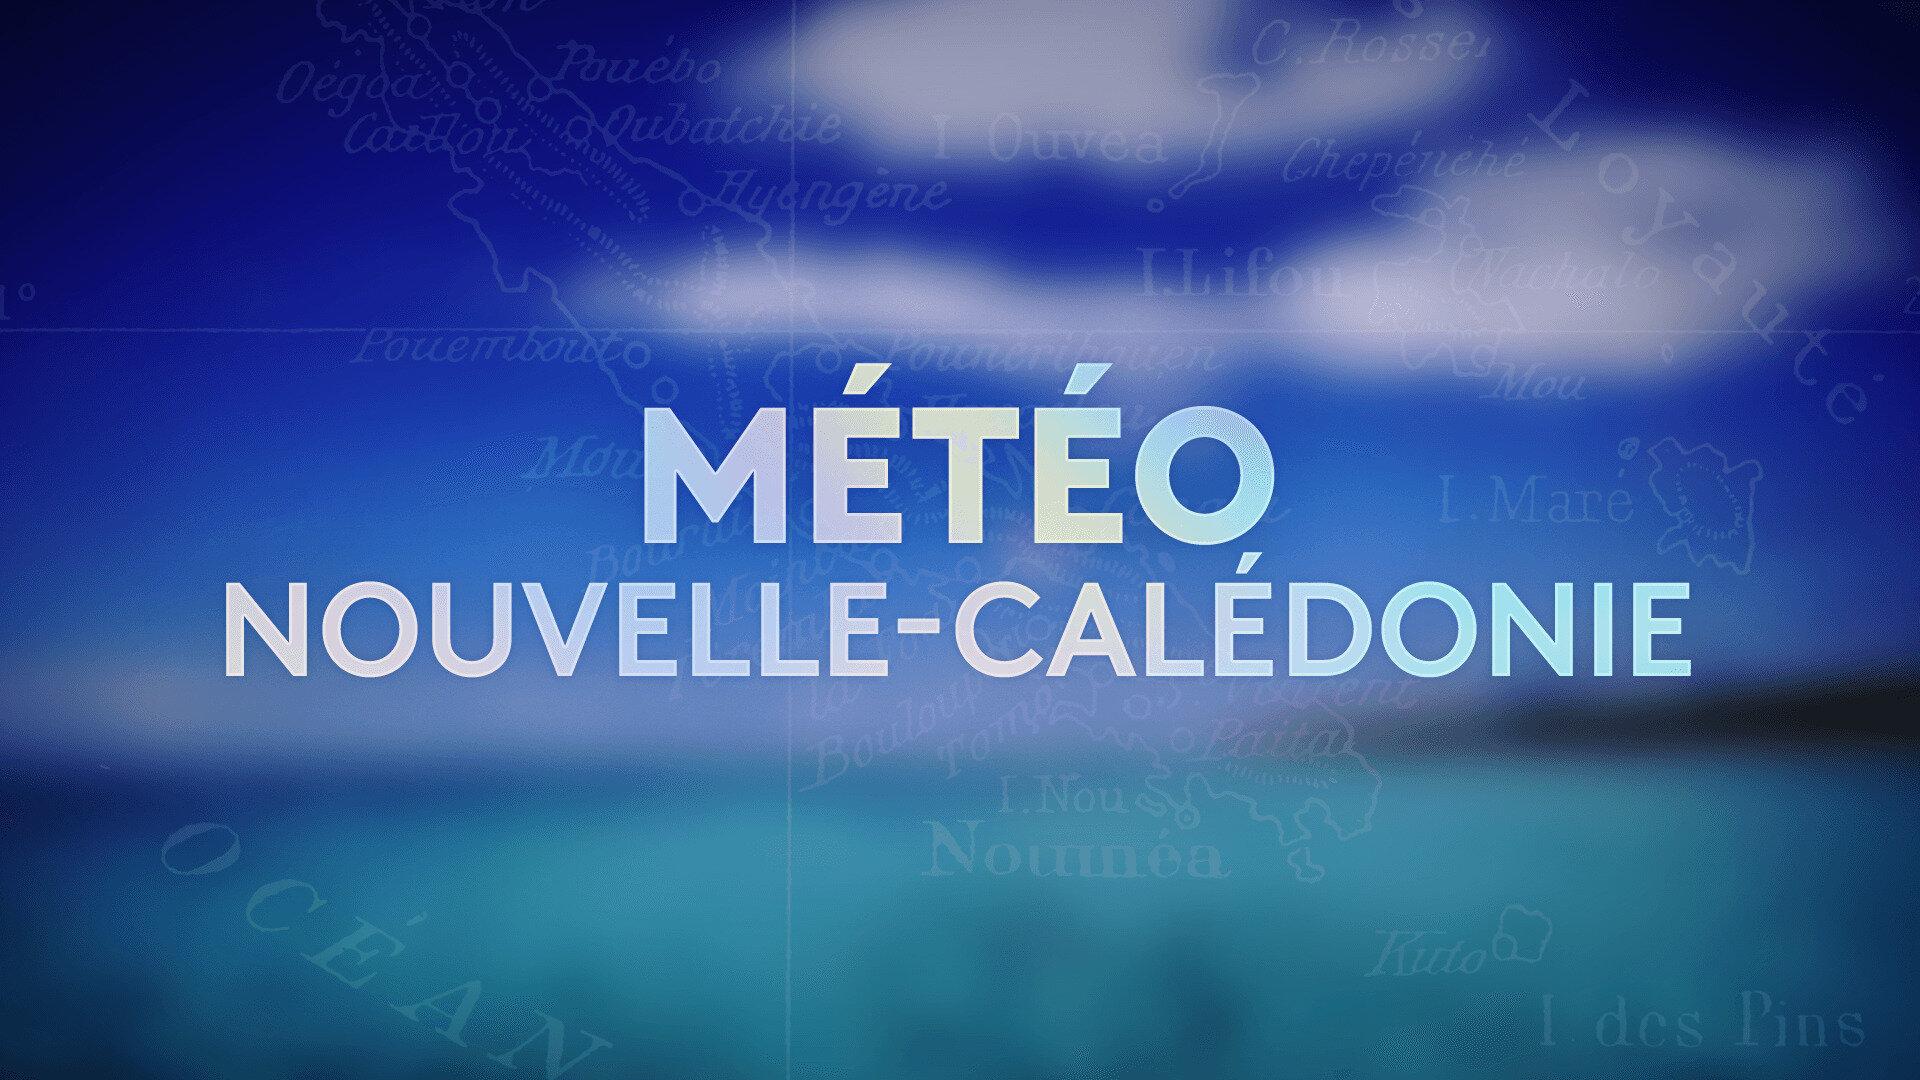 Météo Calédonie